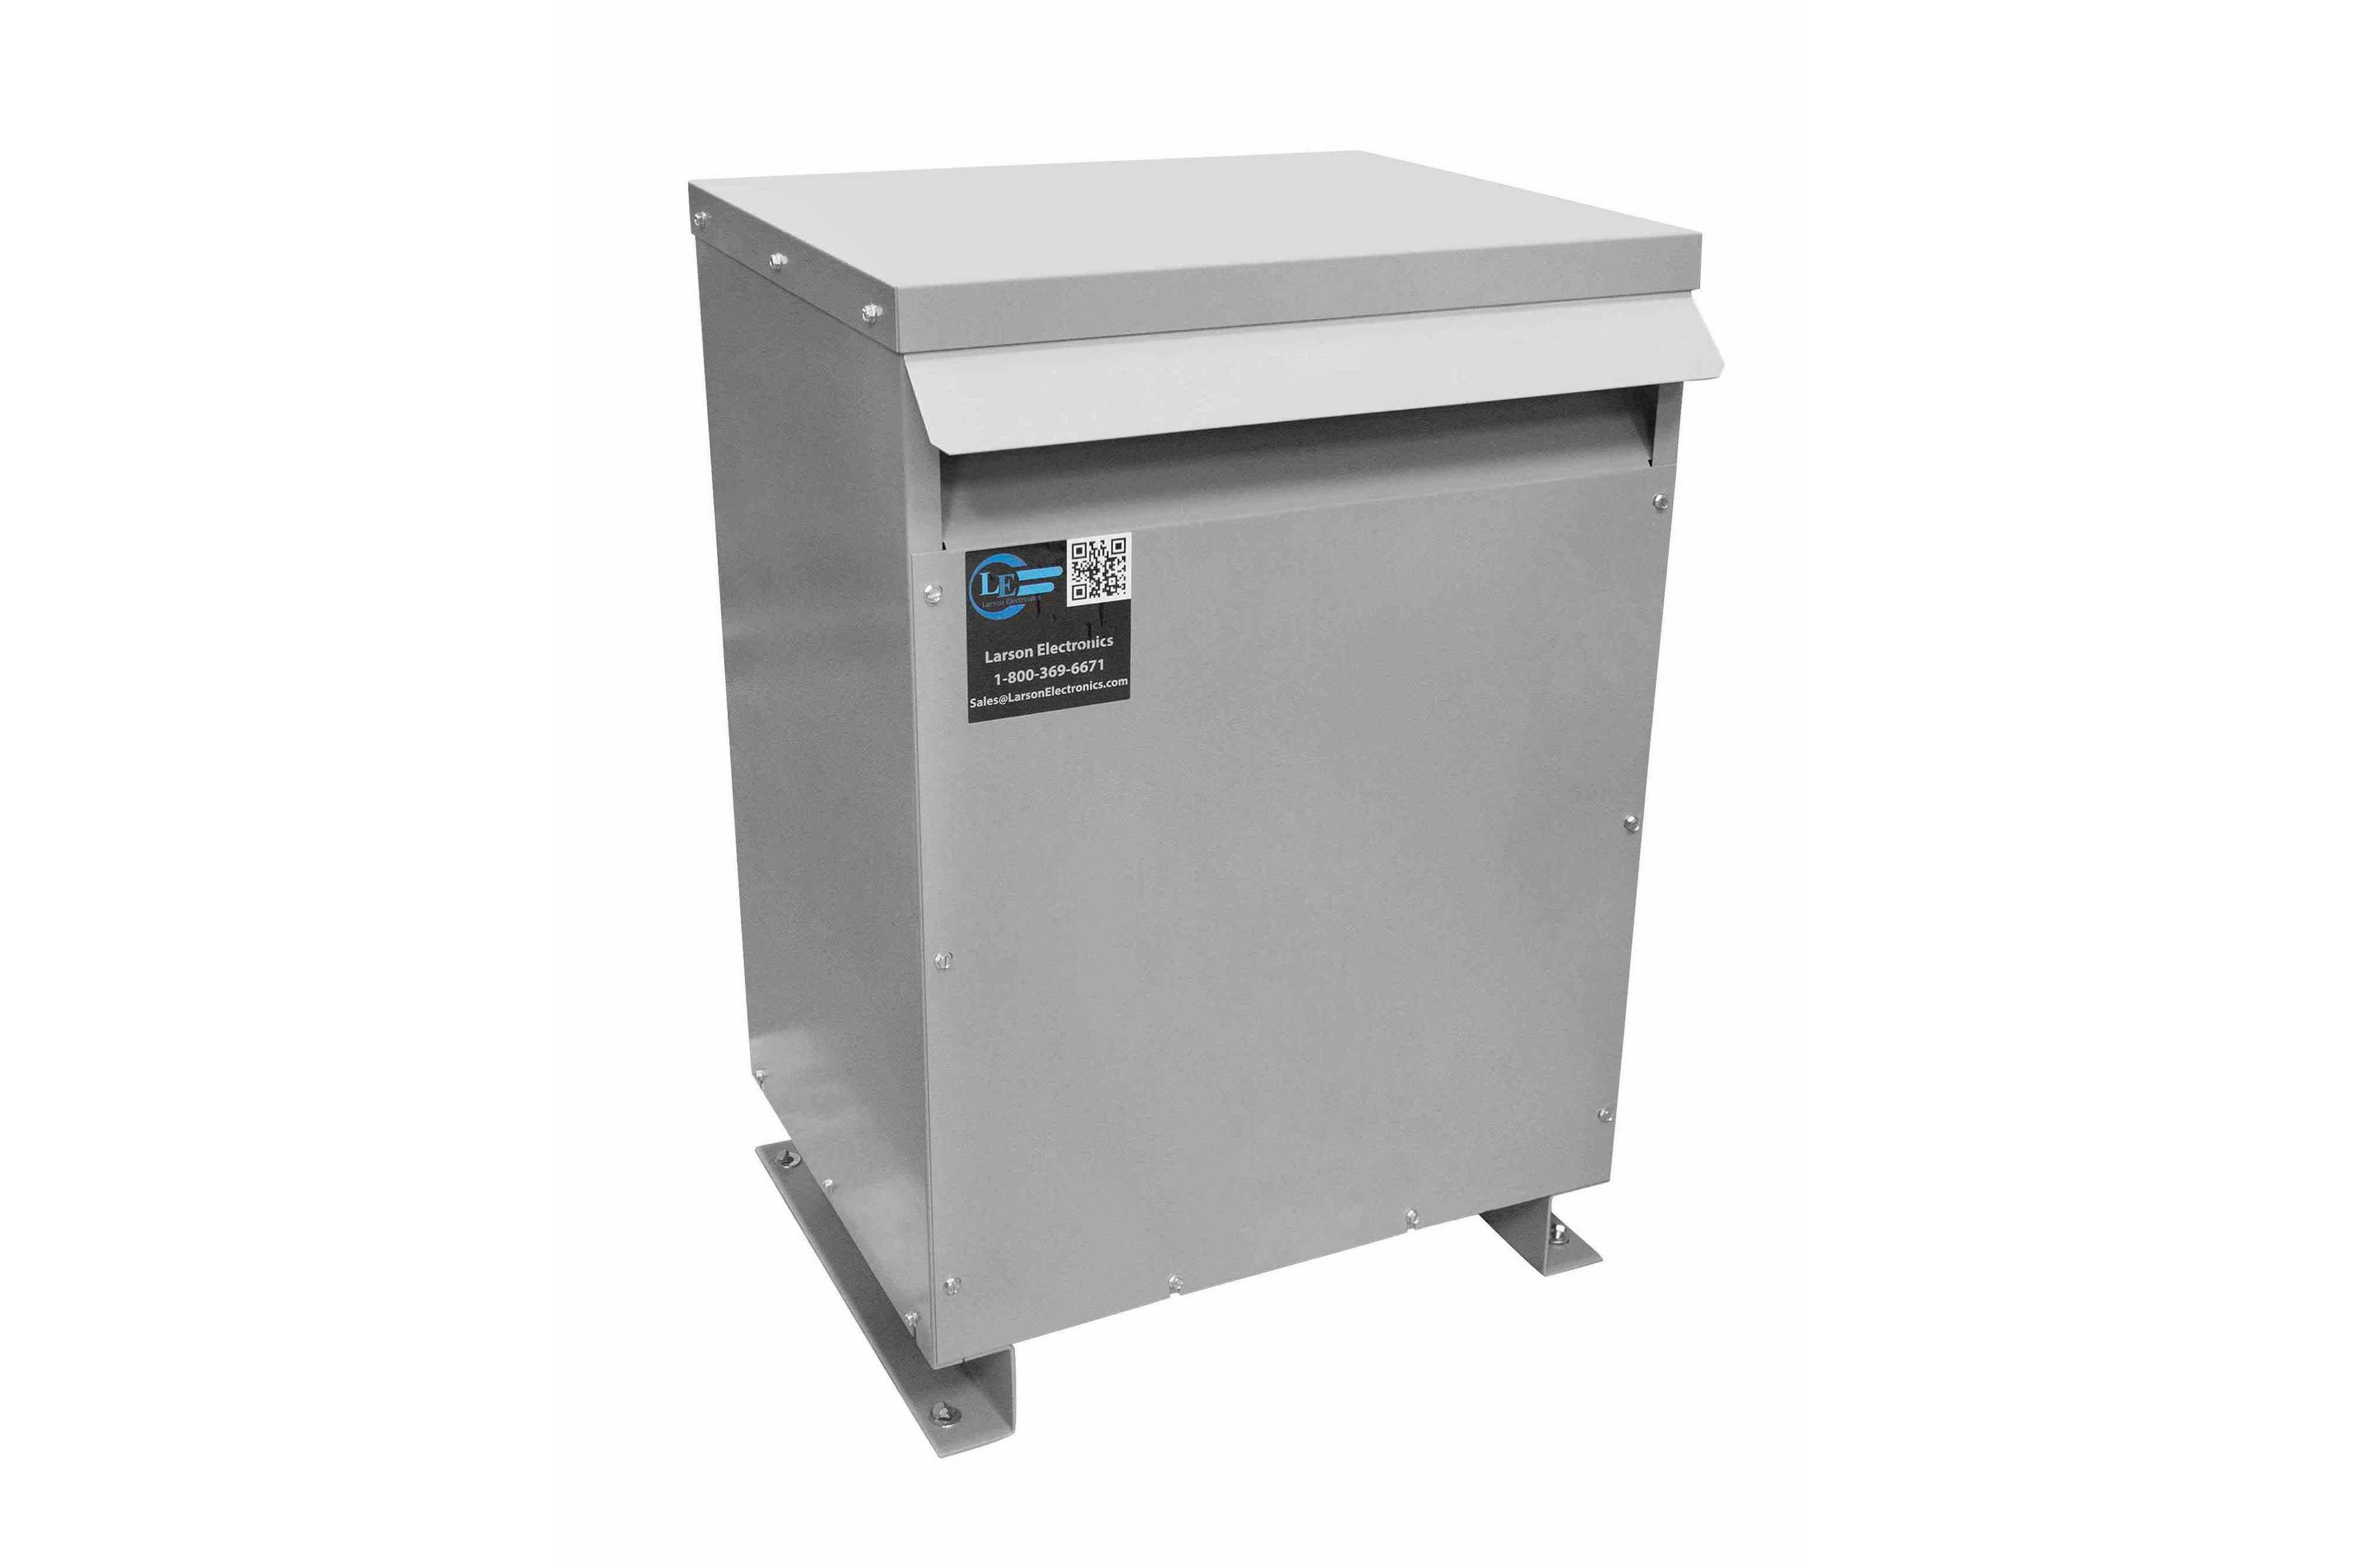 29 kVA 3PH Isolation Transformer, 400V Wye Primary, 240V Delta Secondary, N3R, Ventilated, 60 Hz